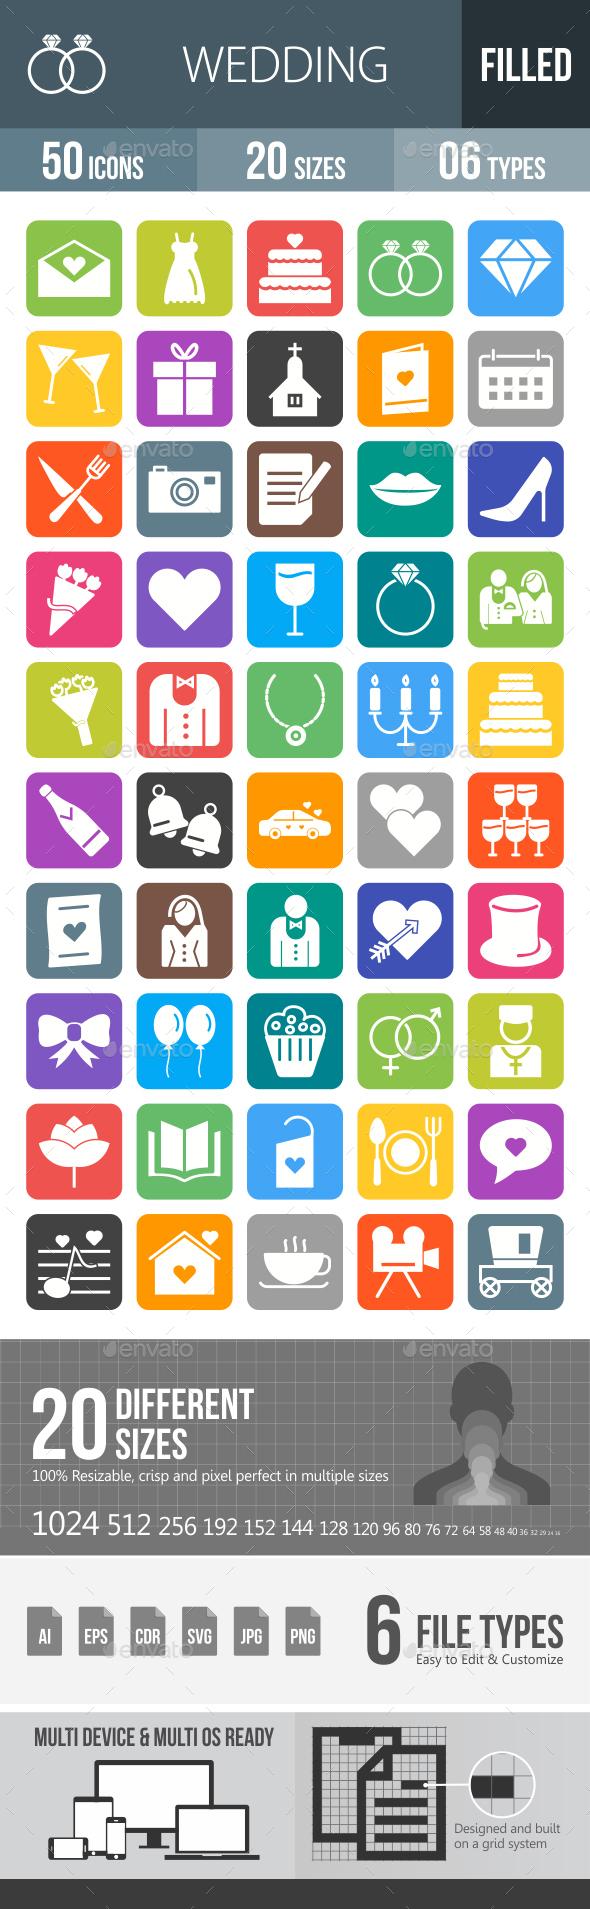 50 Wedding Filled Round Corner Icons - Icons